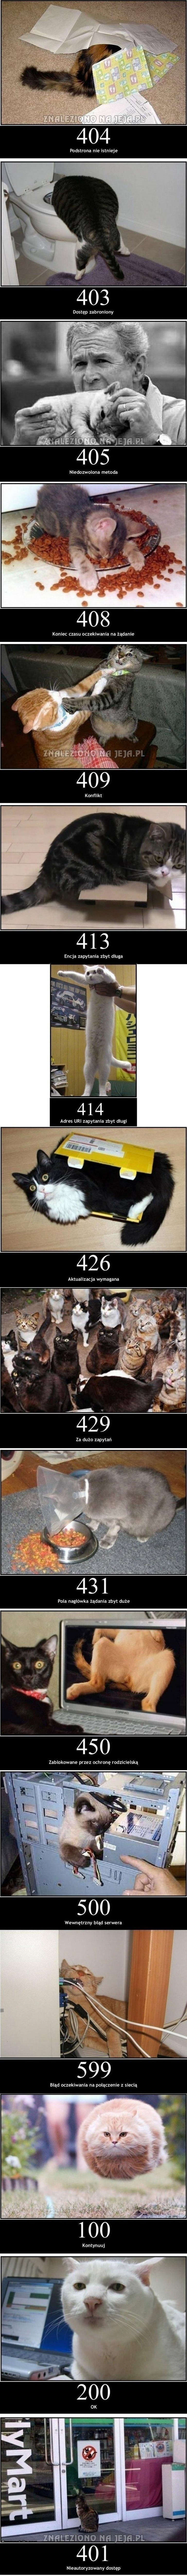 Koty i błędy